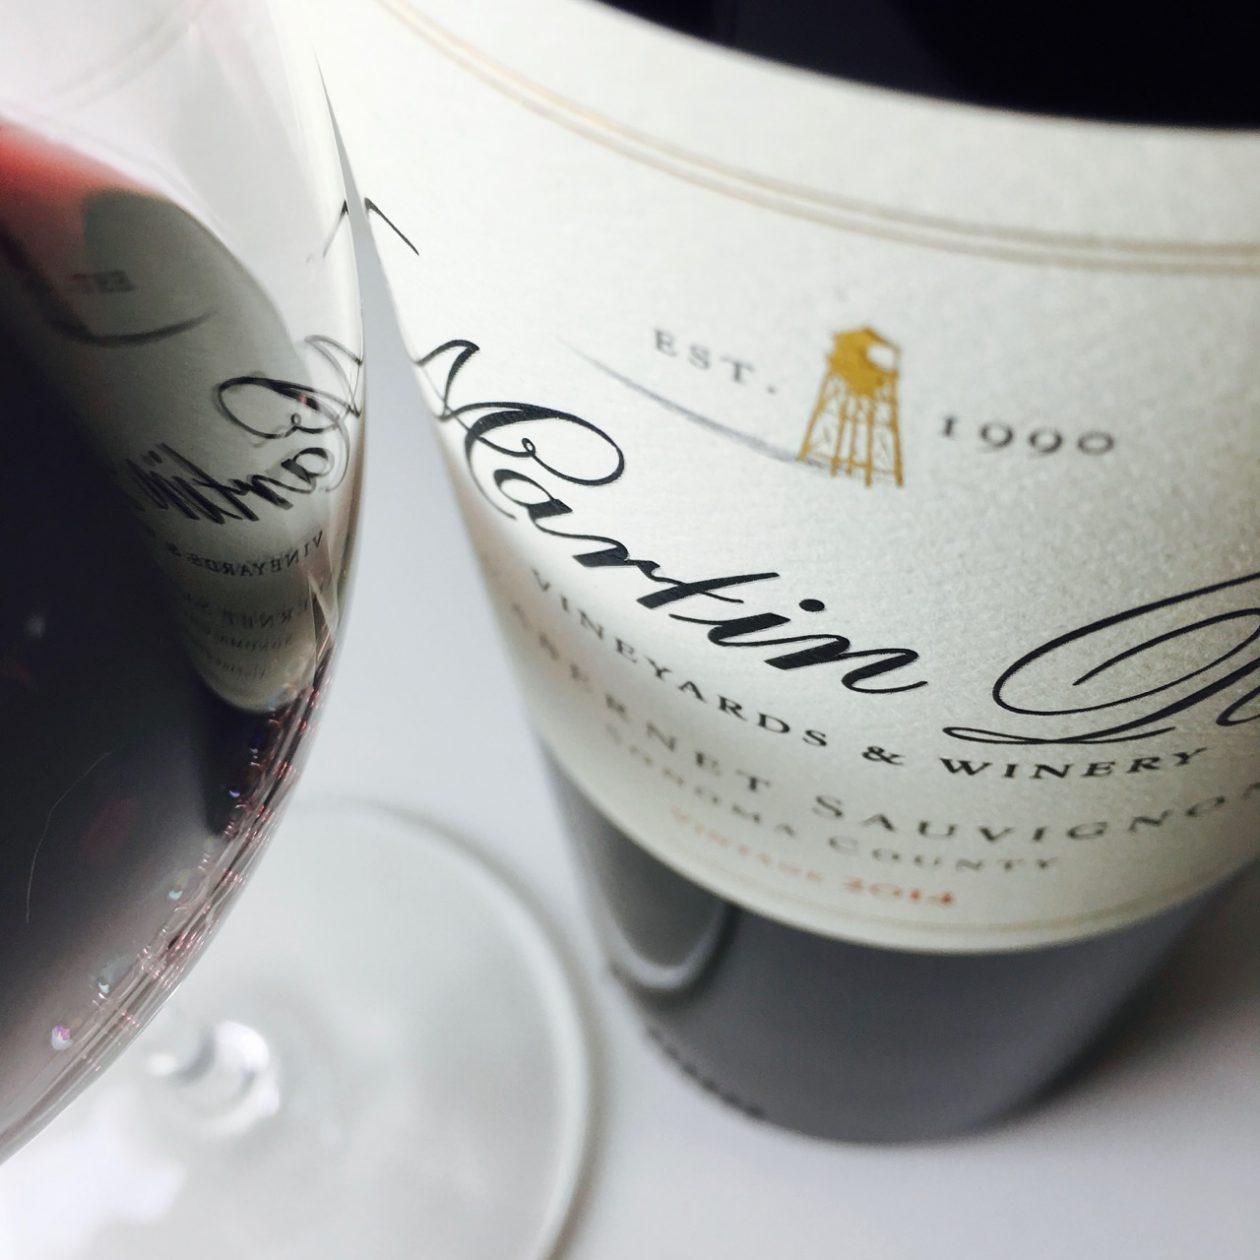 2014 Martin Ray Vineyards & Winery Cabernet Sauvignon Sonoma County